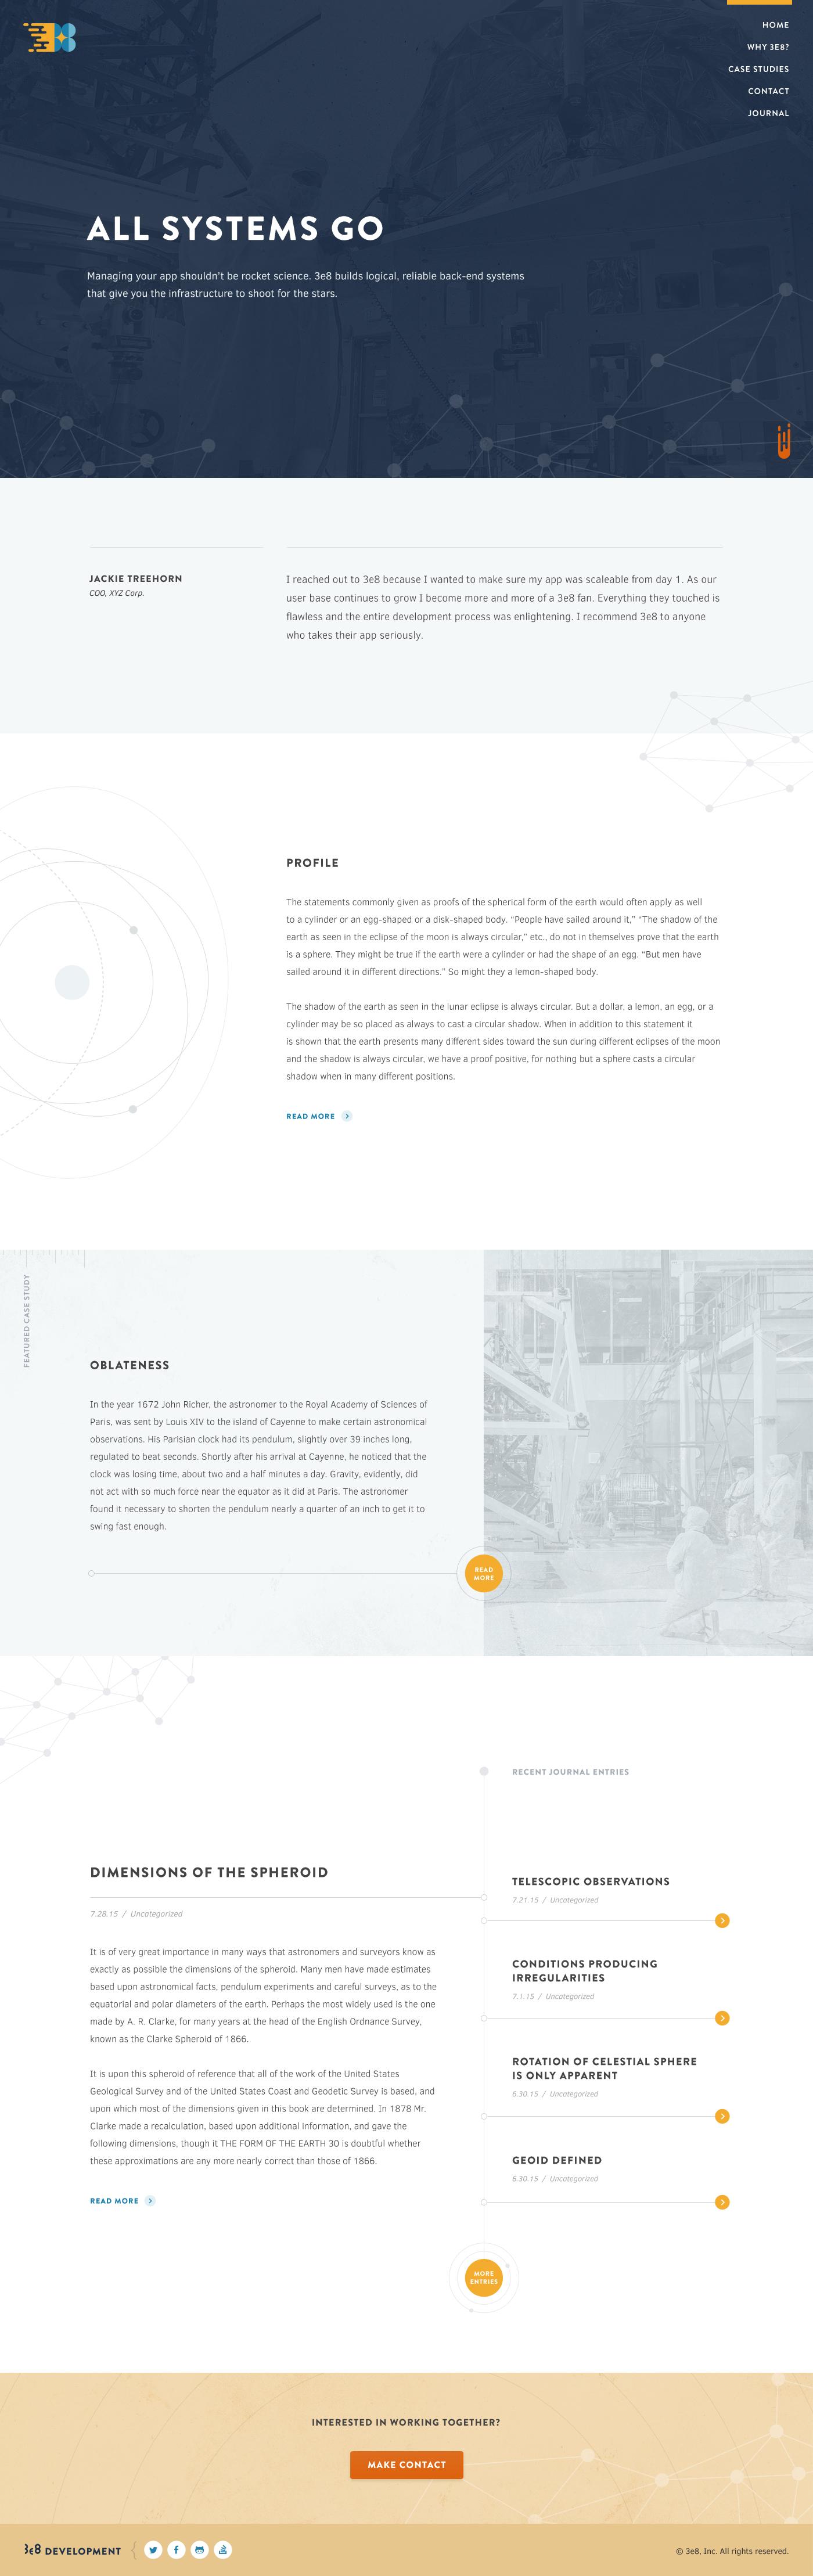 3e8 homepage